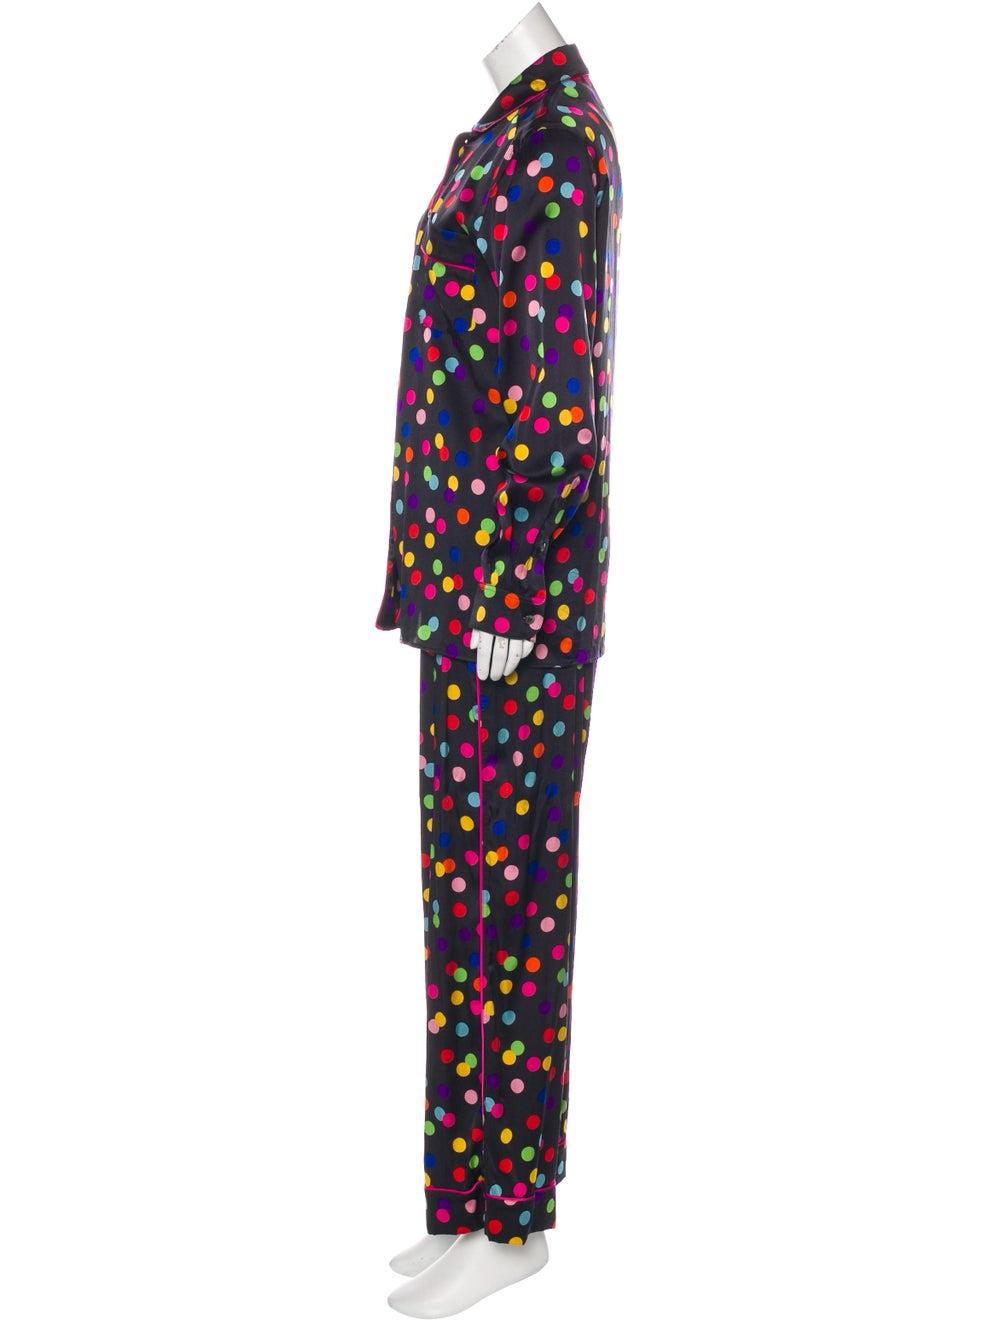 Dolce & Gabbana Polka Dot Silk Pajama Set Black - image 2